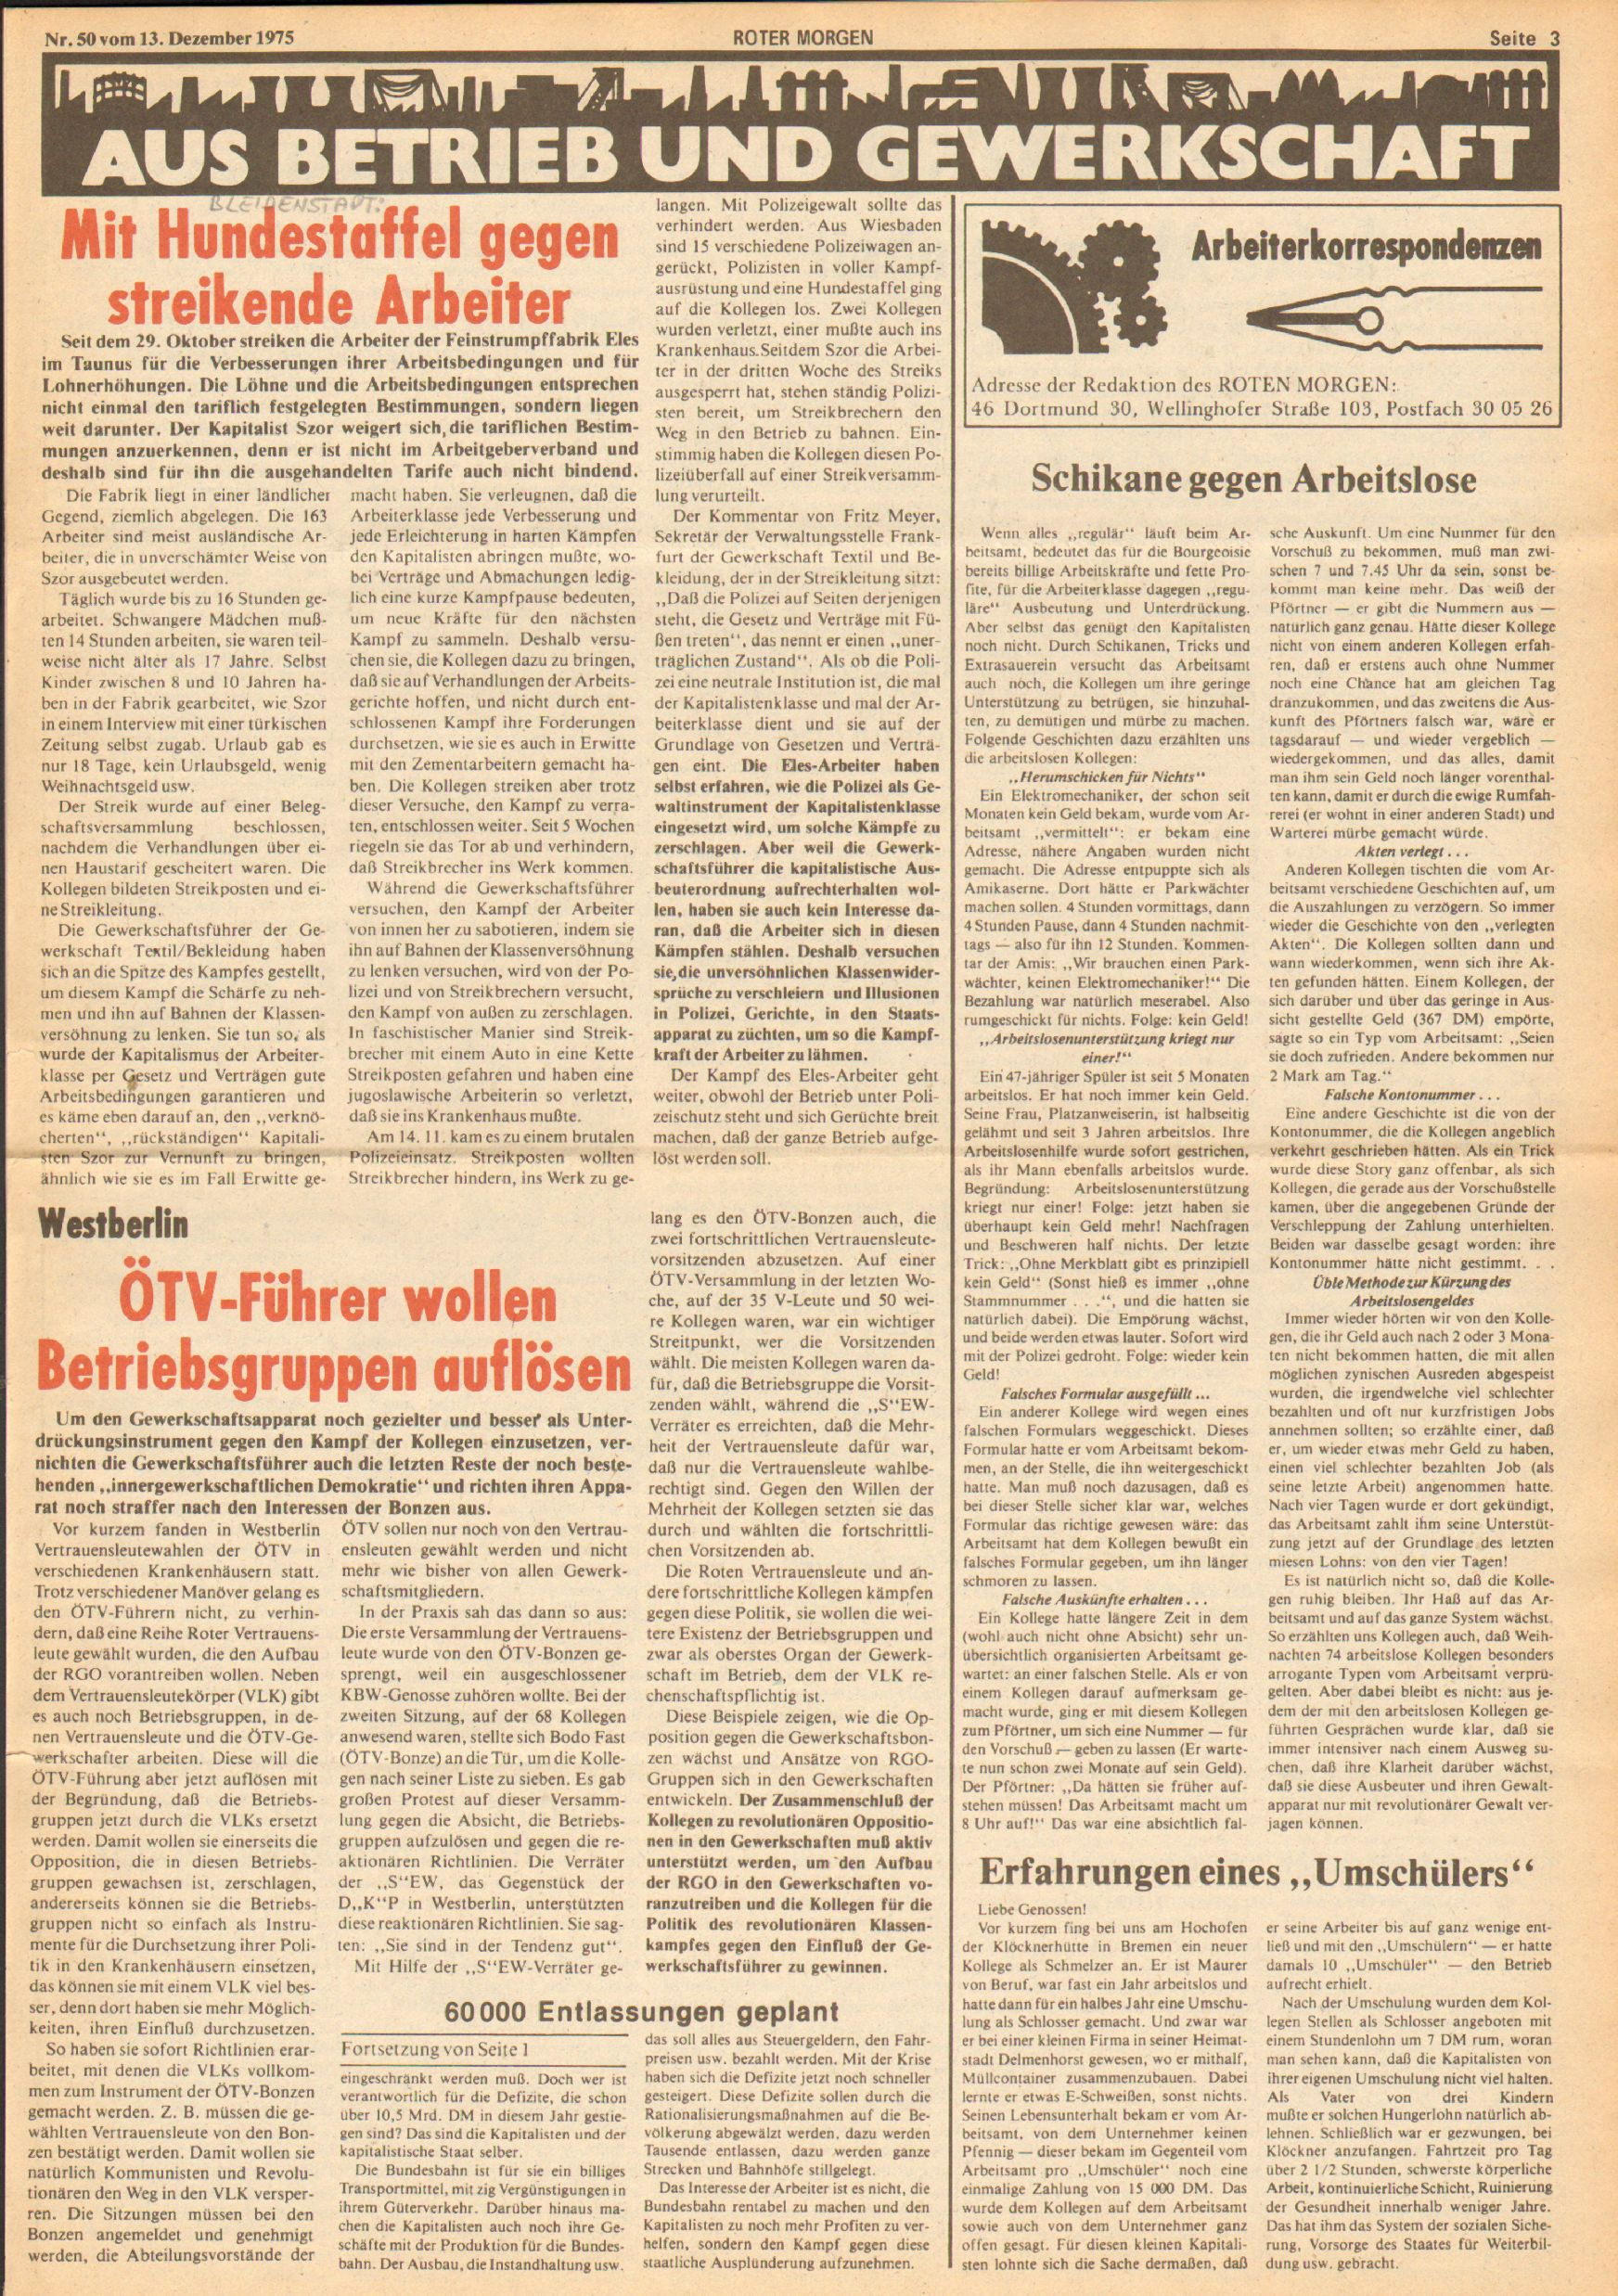 Roter Morgen, 9. Jg., 13. Dezember 1975, Nr. 50, Seite 3